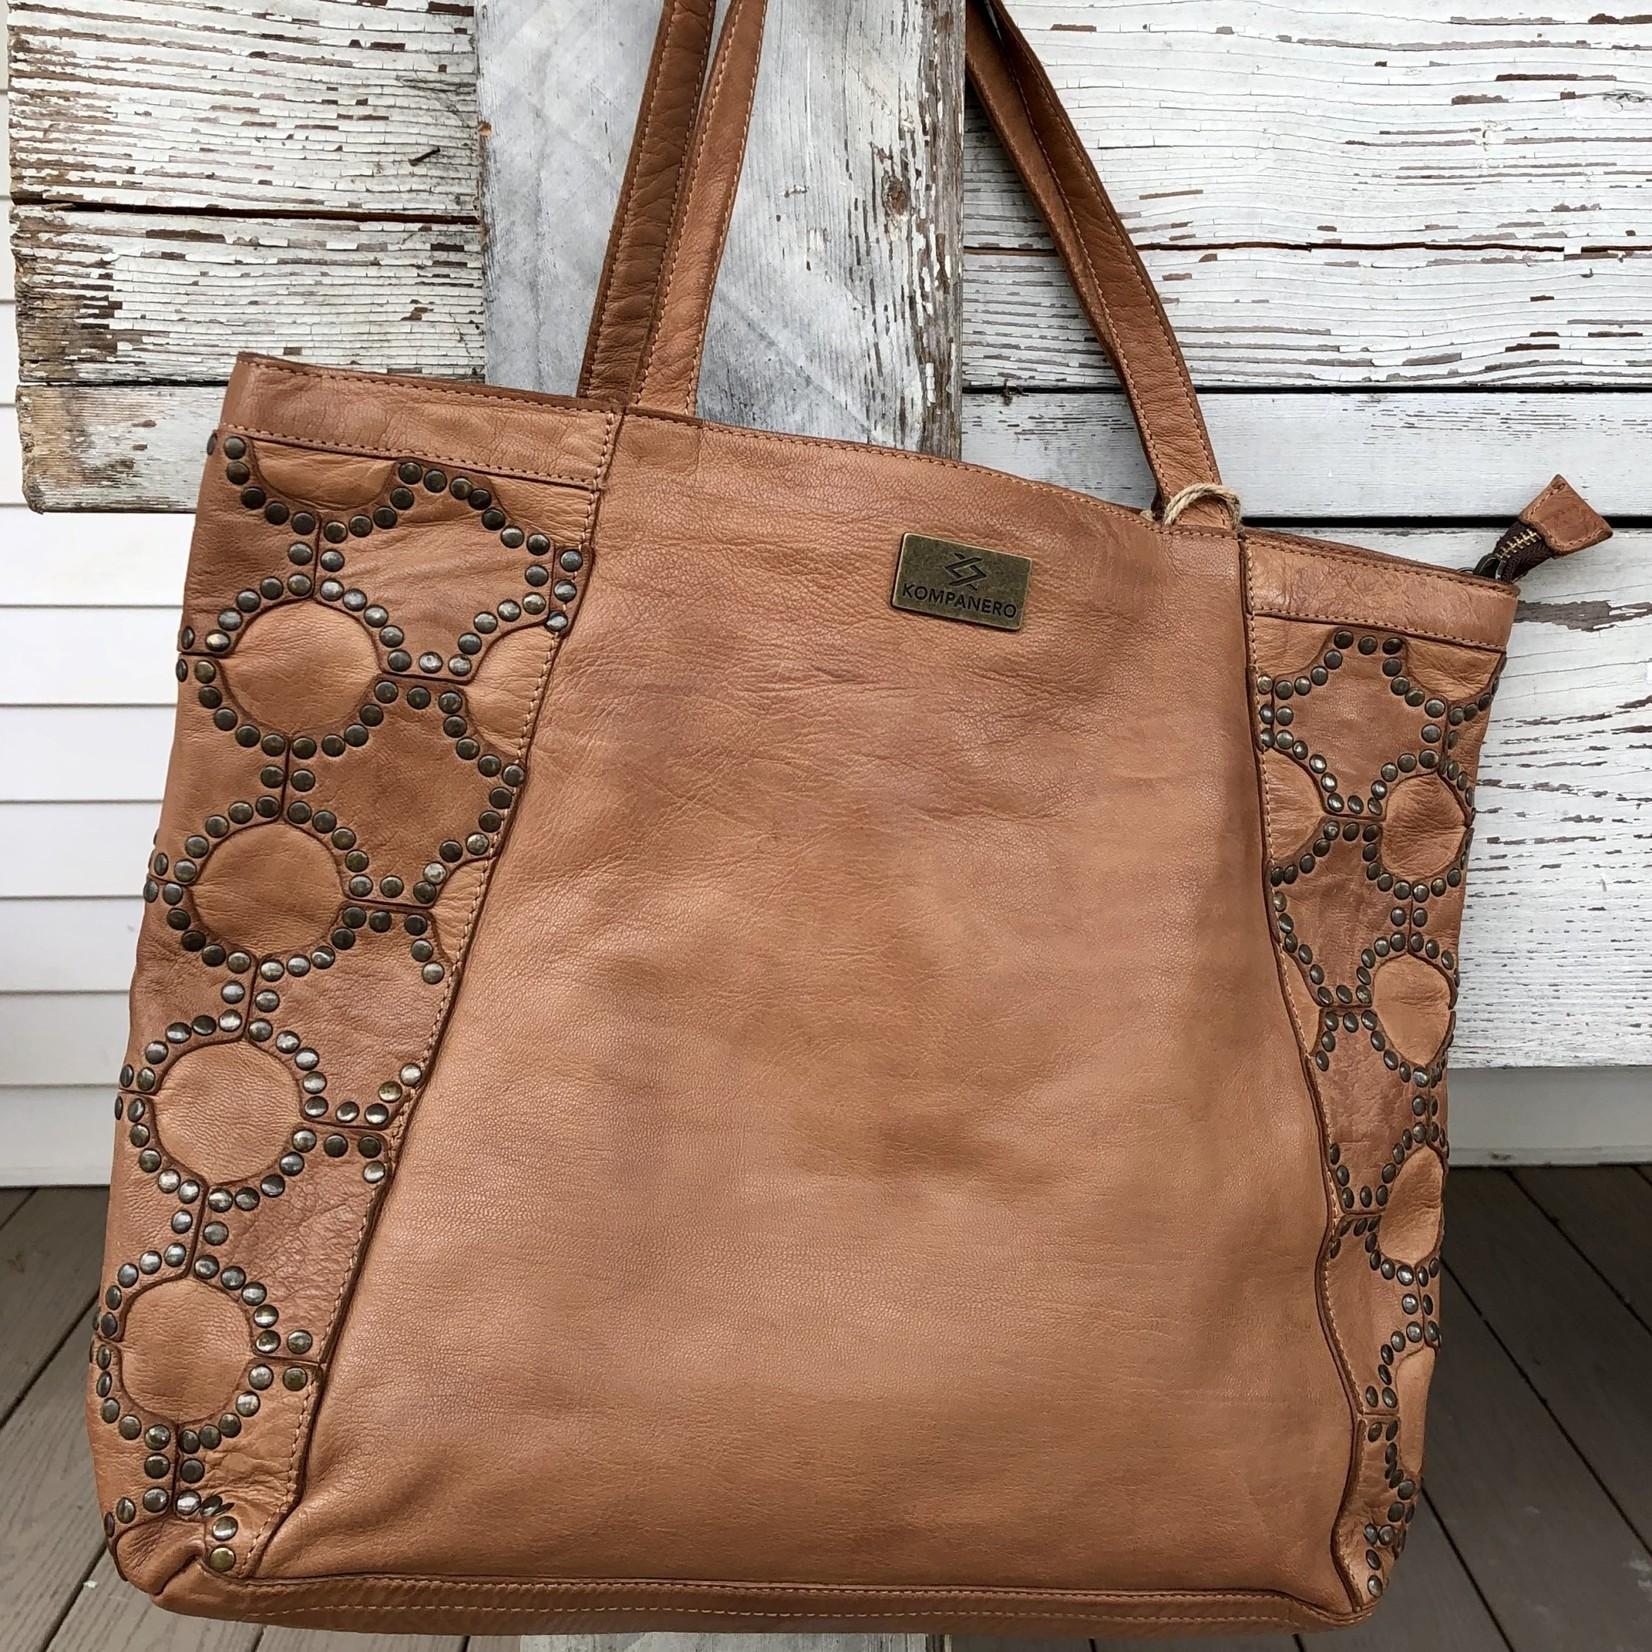 KOMPANERO Kompanero   Large Leather Shoulder Bag